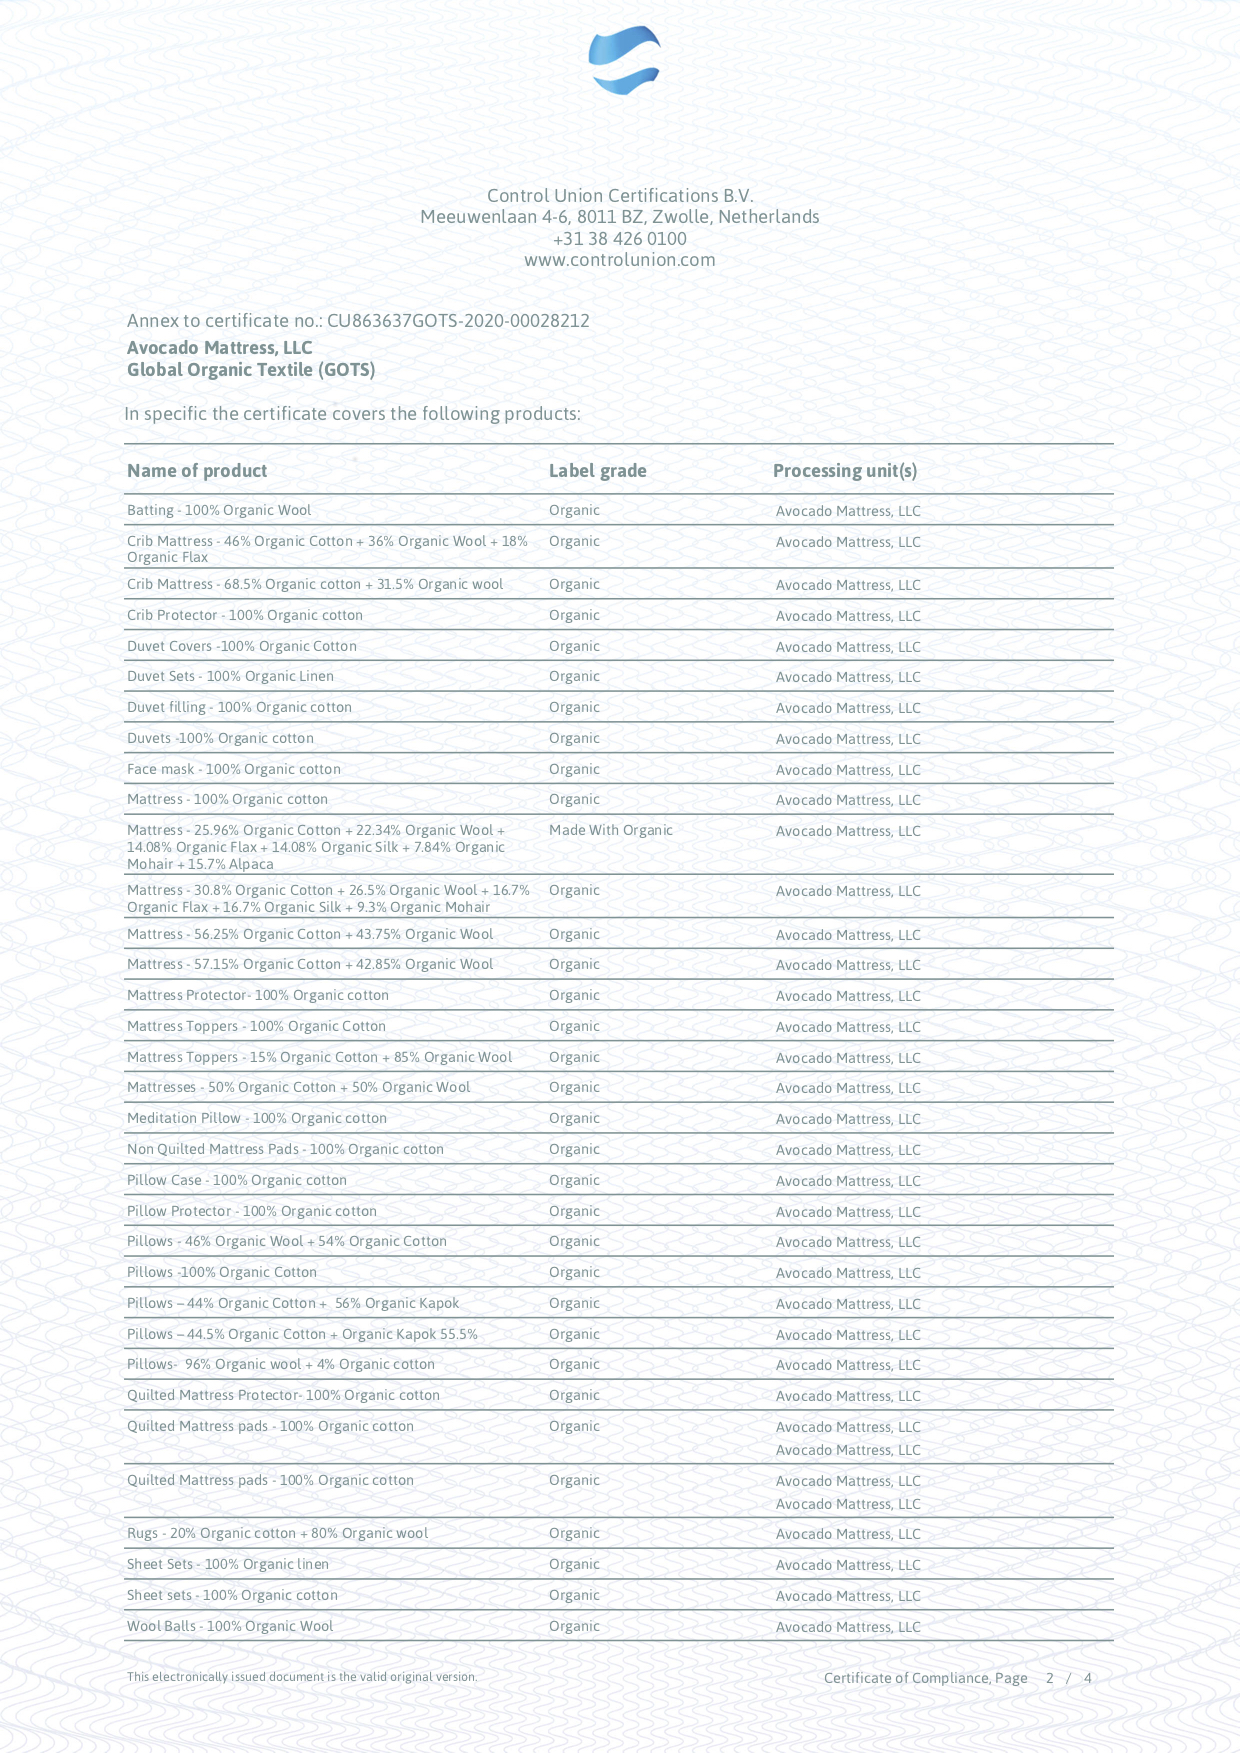 GOTS_Scope_Certificate_2020-07-11_05_29_15_UTC_page_2.jpg